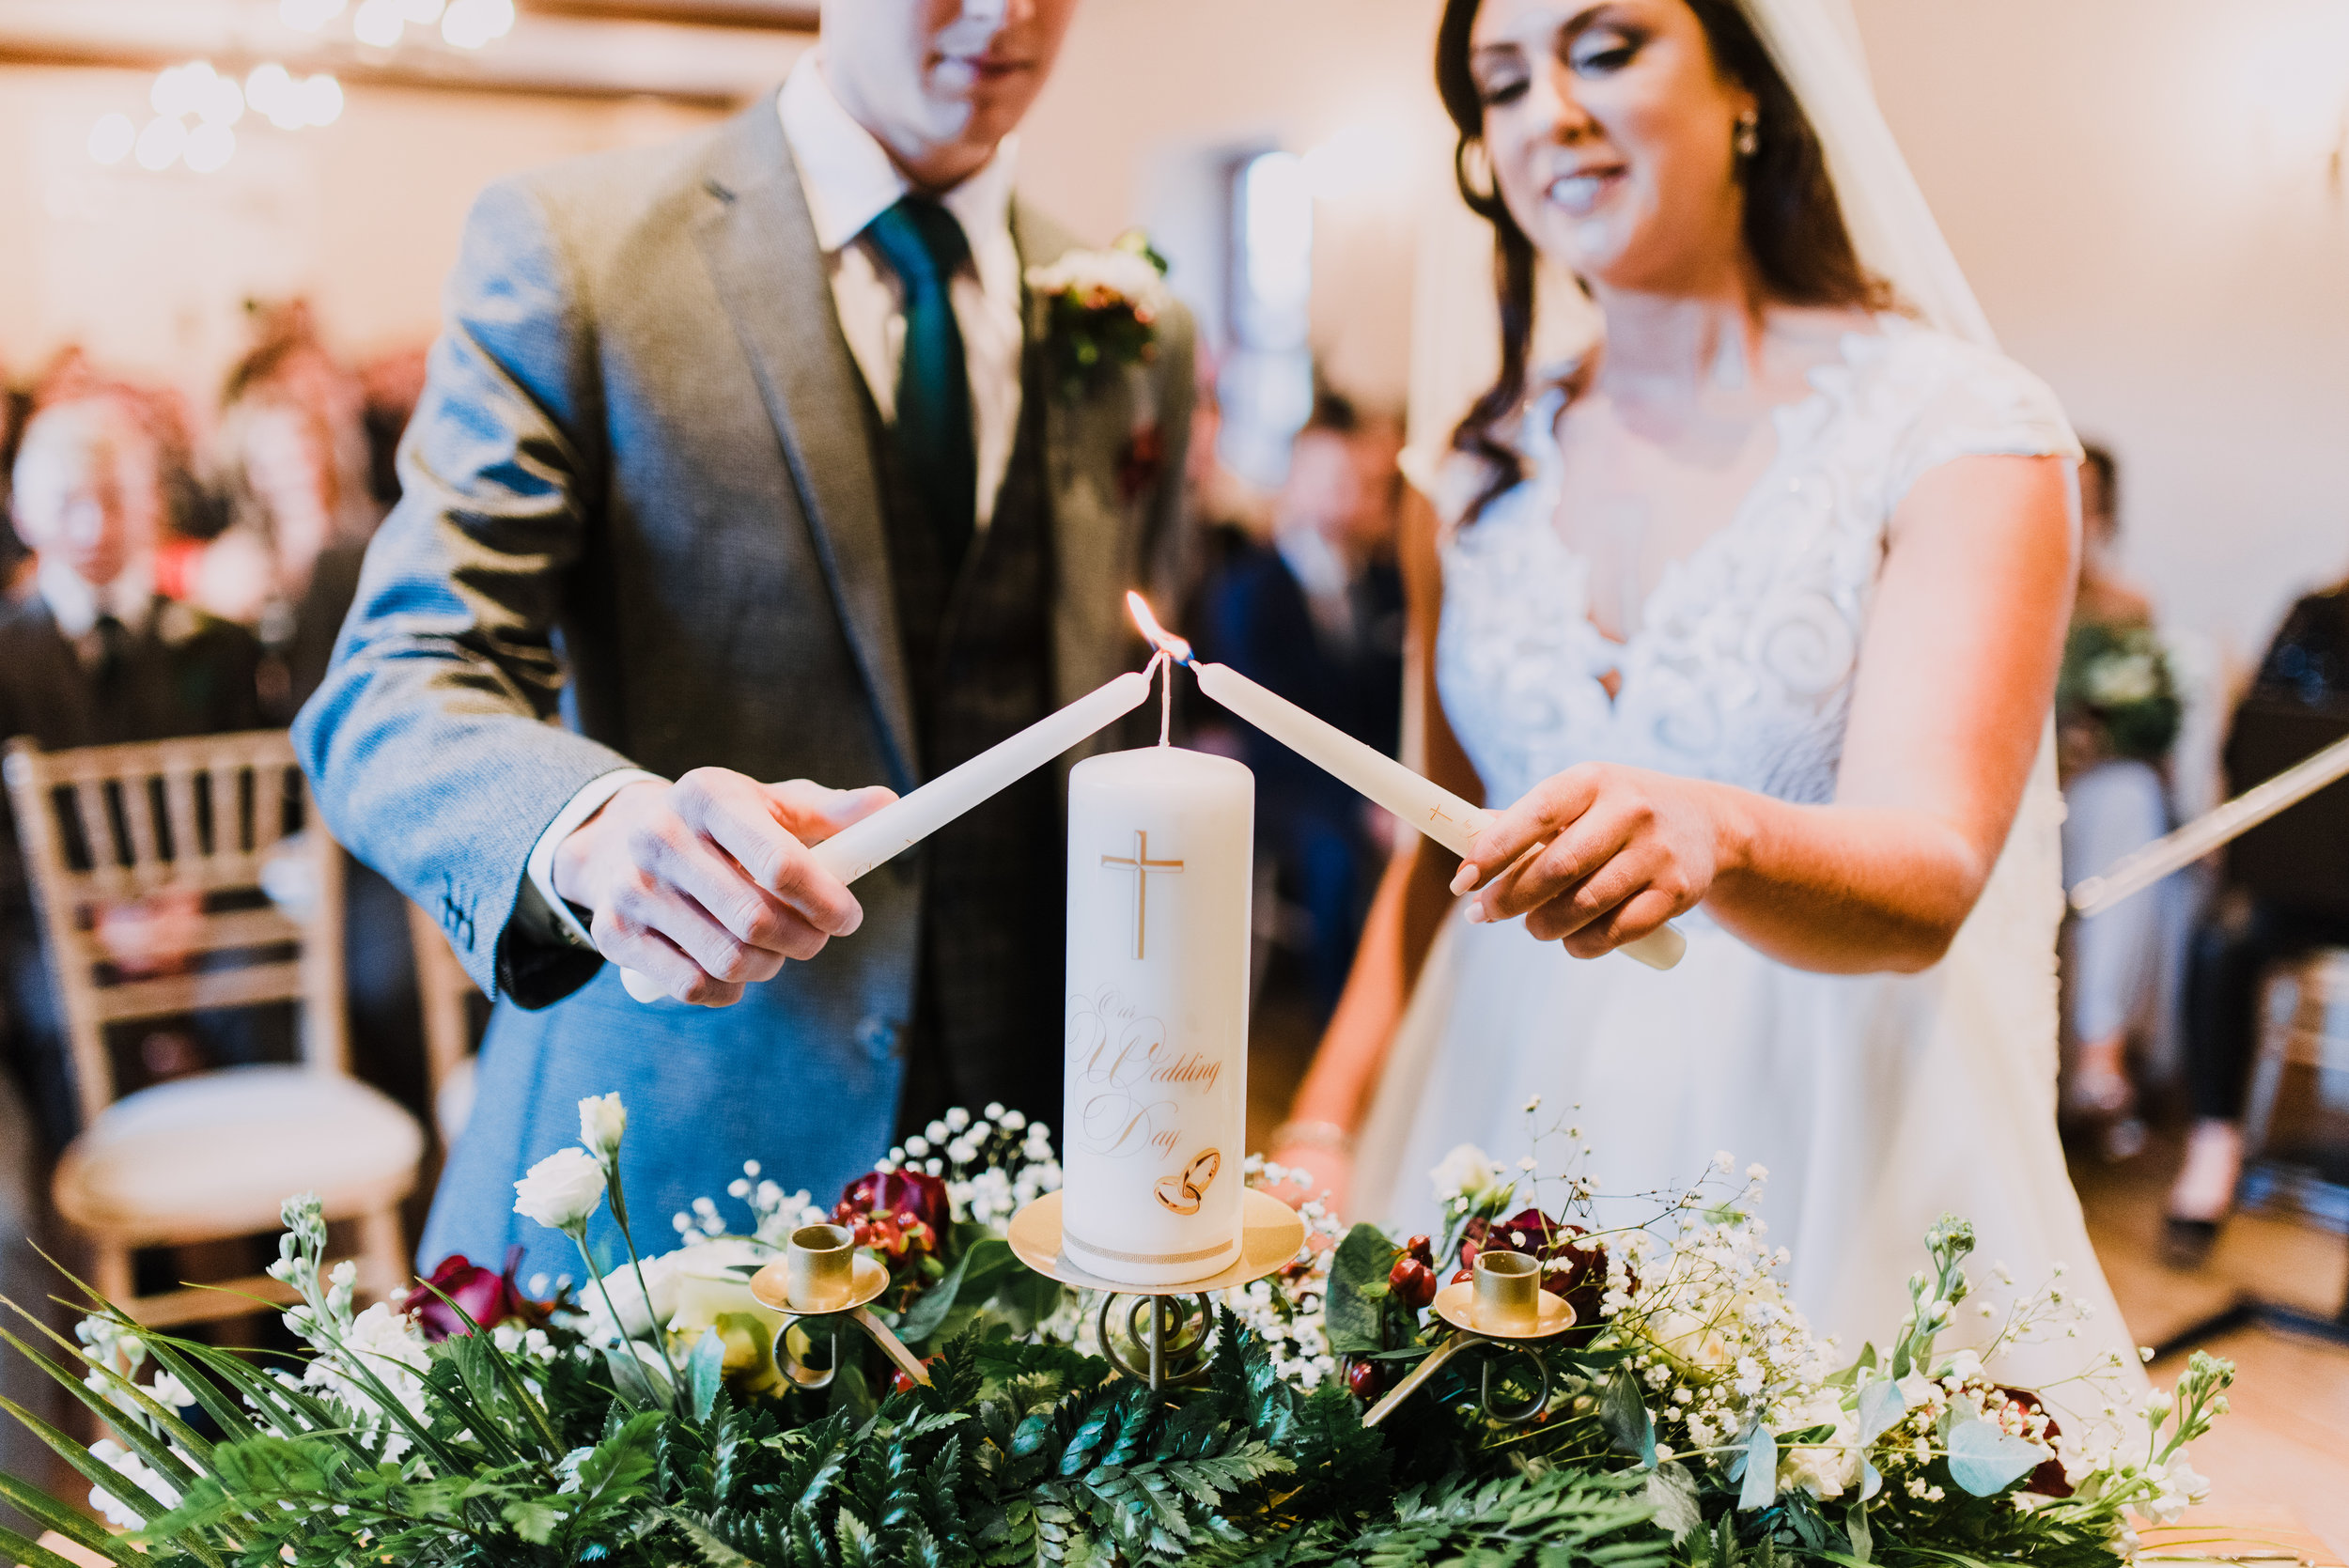 larchfield estate wedding, wedding venues northern ireland, barn wedding venues northern ireland, quirky weddings northern ireland, 5 star wedding venues ni, wedding ceremony larchfield estate  (10).jpg